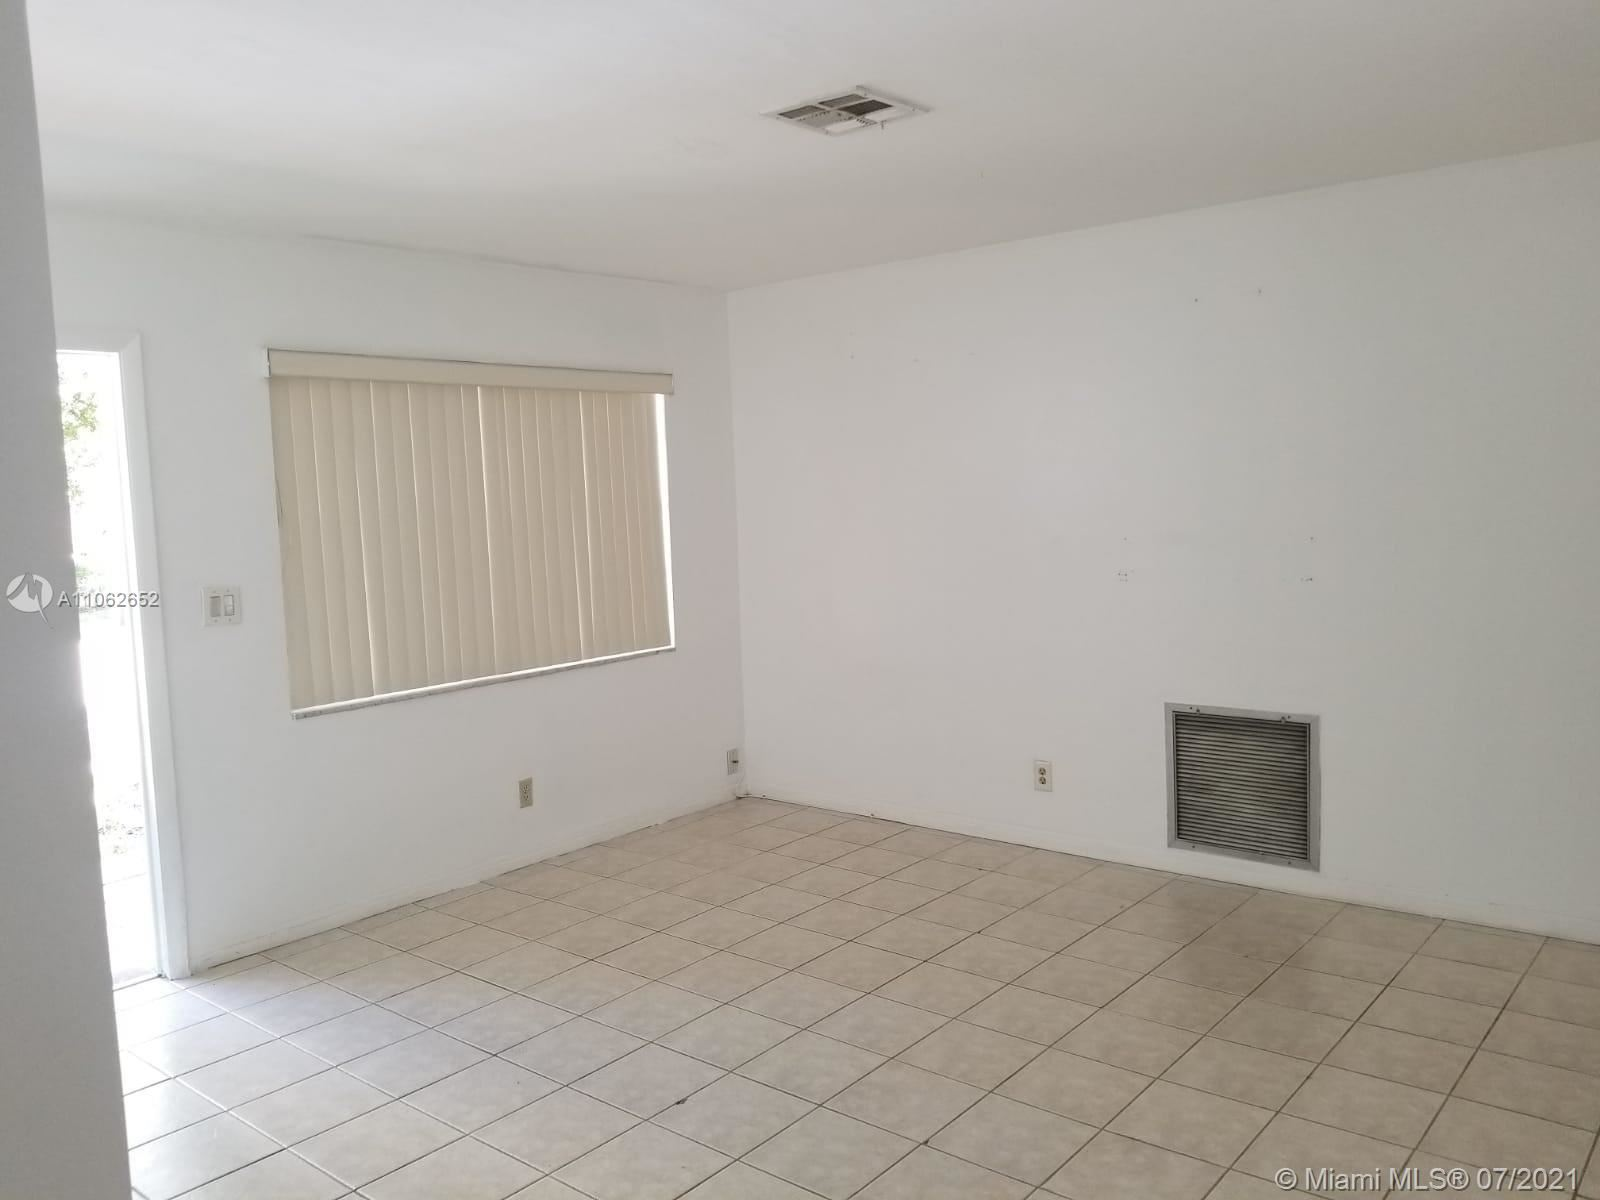 Photo of 701 NW 1st St, Hallandale Beach, FL 33009 (MLS # A11062652)